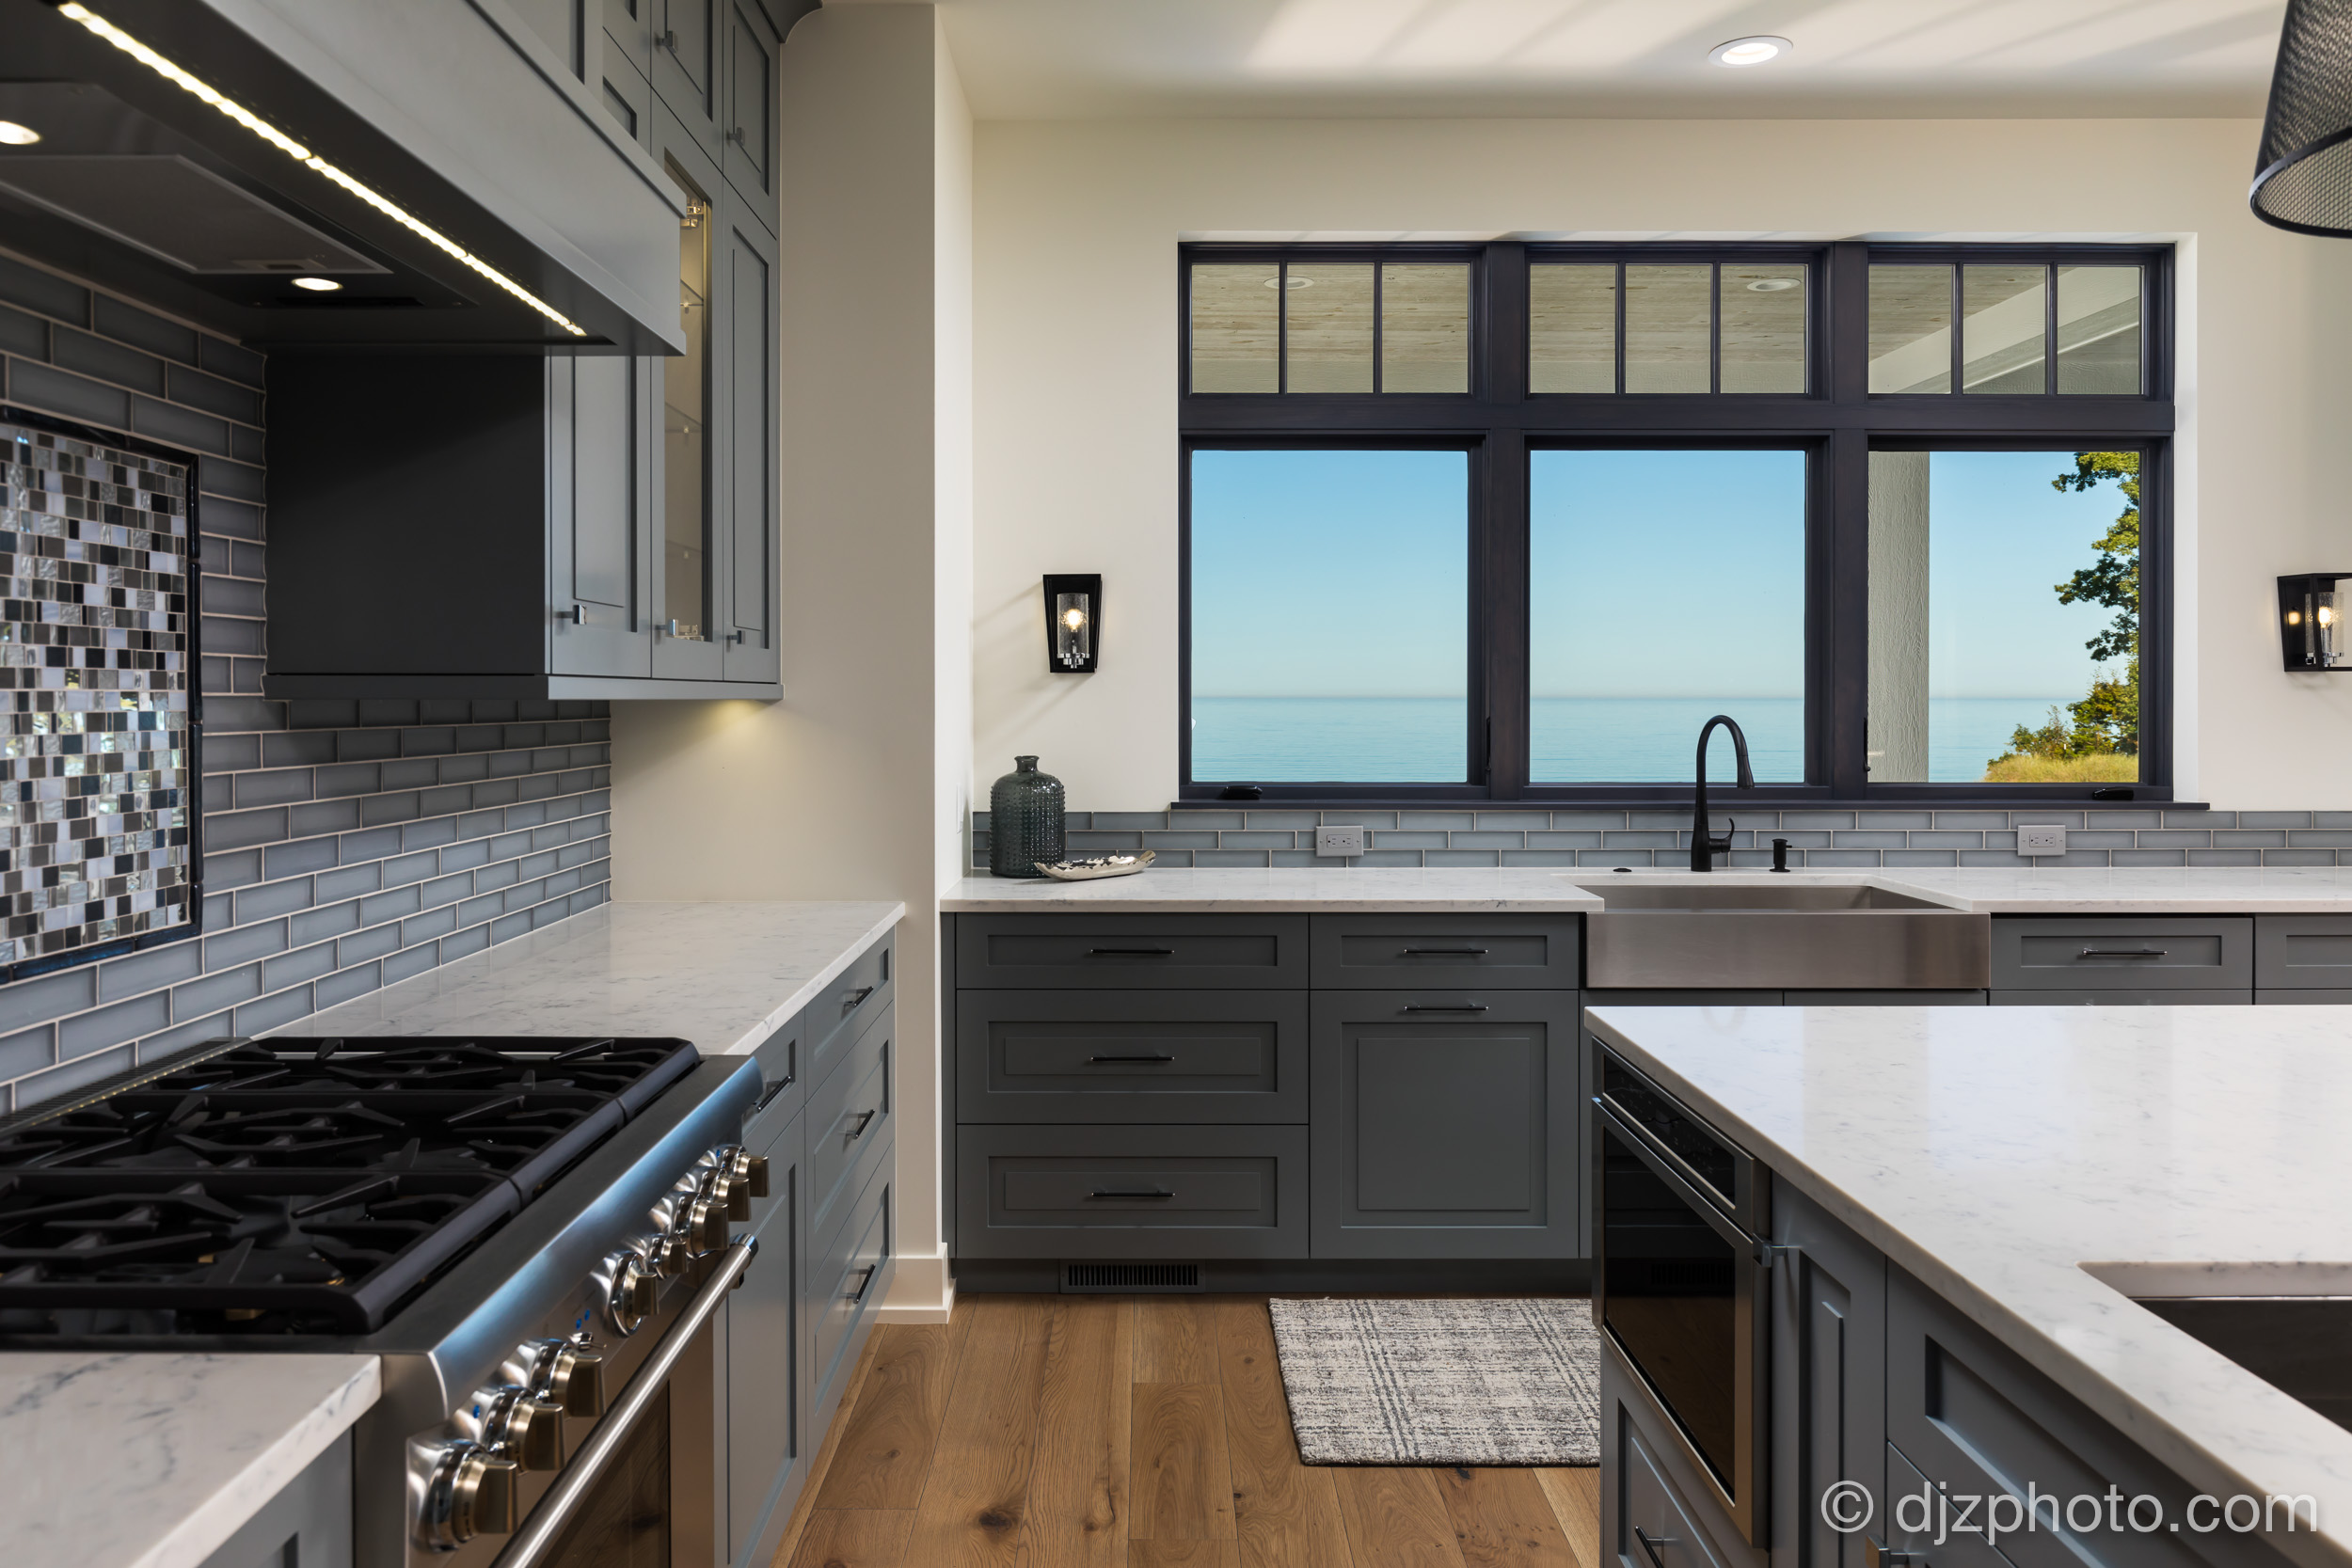 Kitchen by Lake Michigan